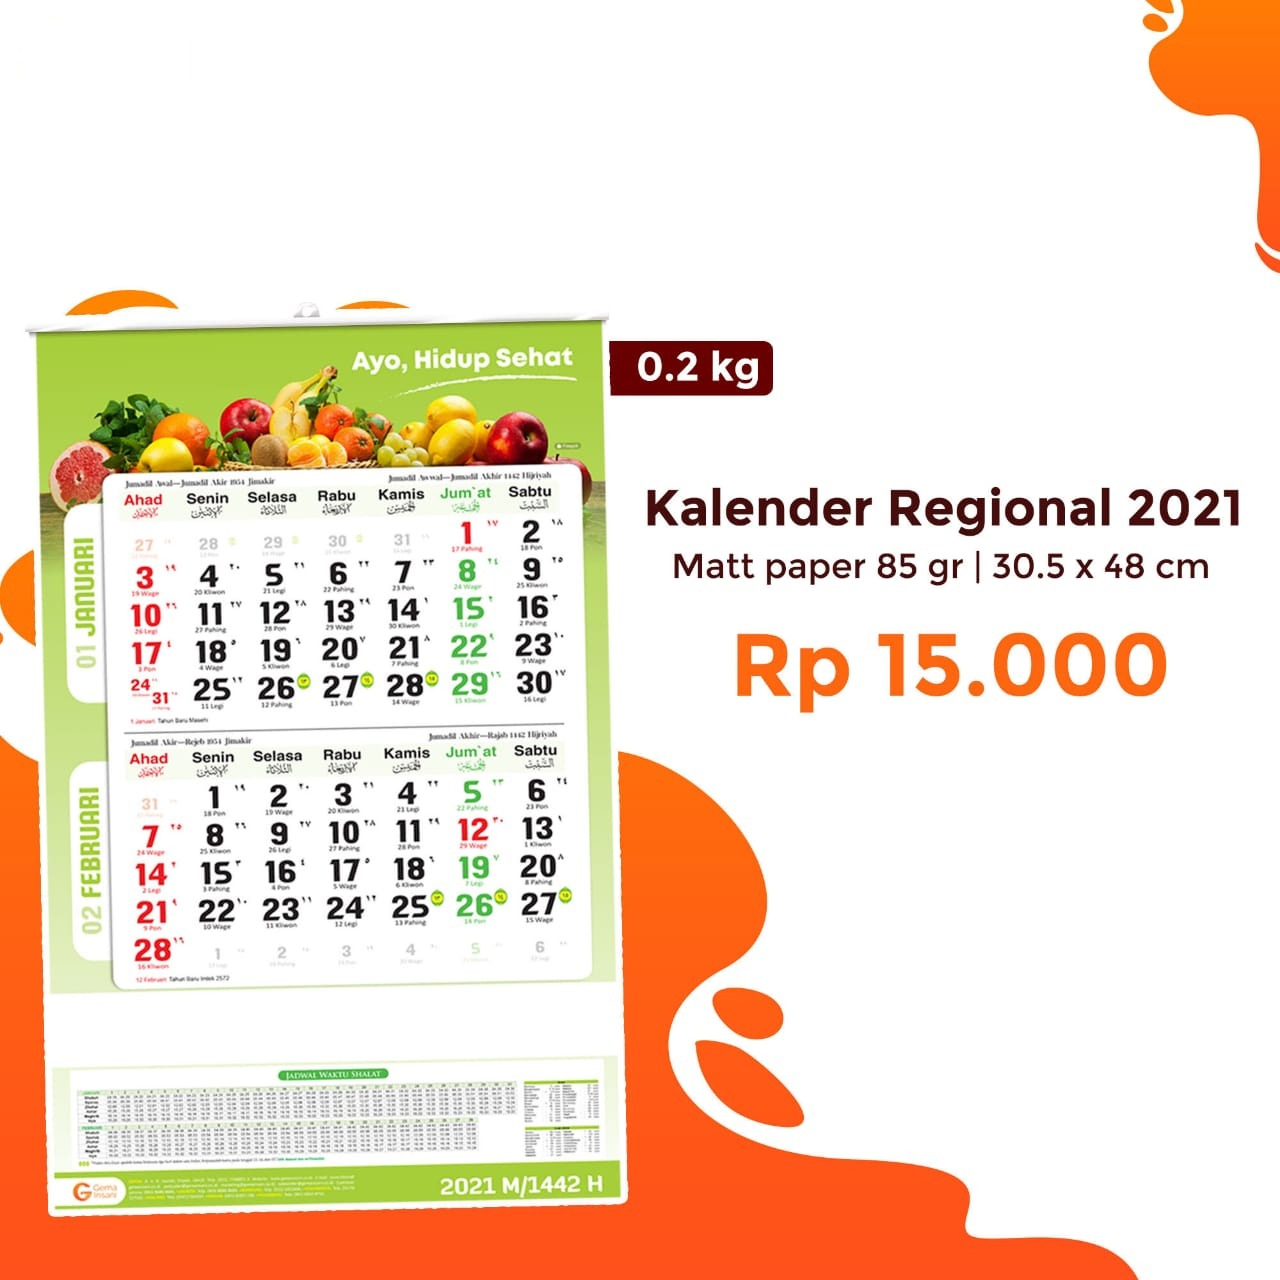 Kalender Regional 2021